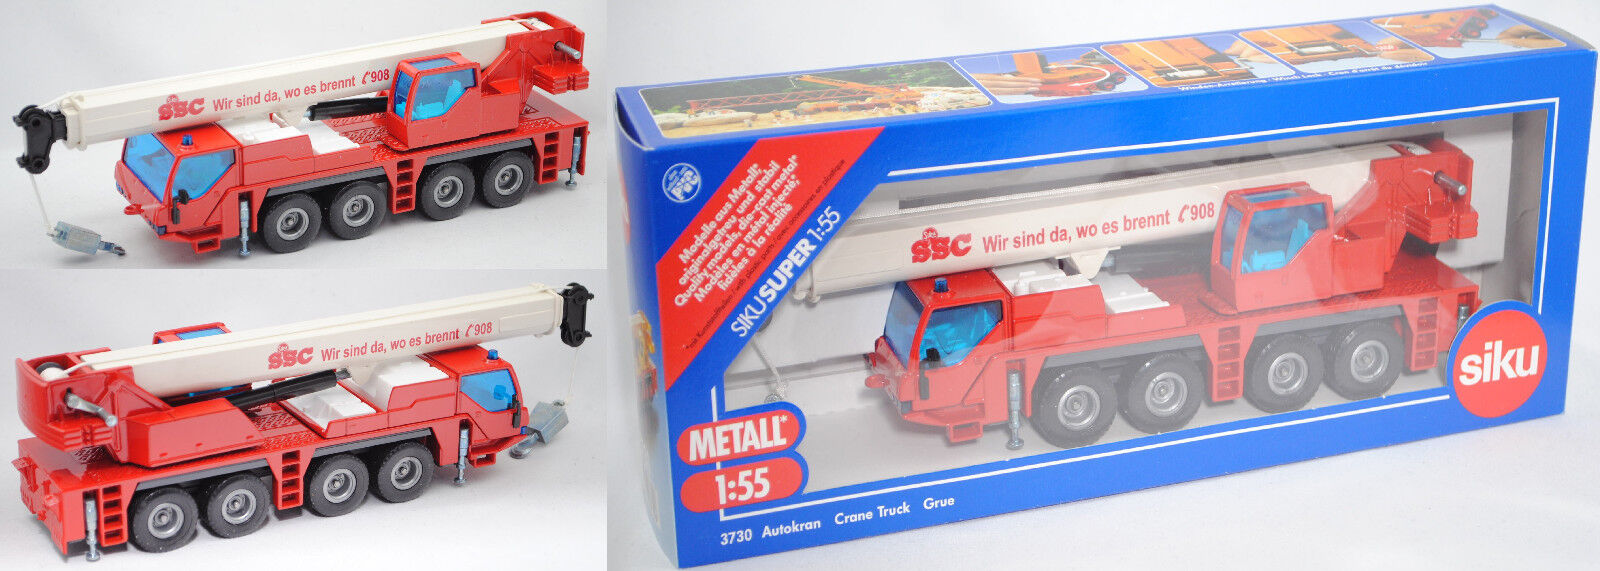 Siku súper 3730 00408 autokran Liebherr LTM 1060 2, SSC colección